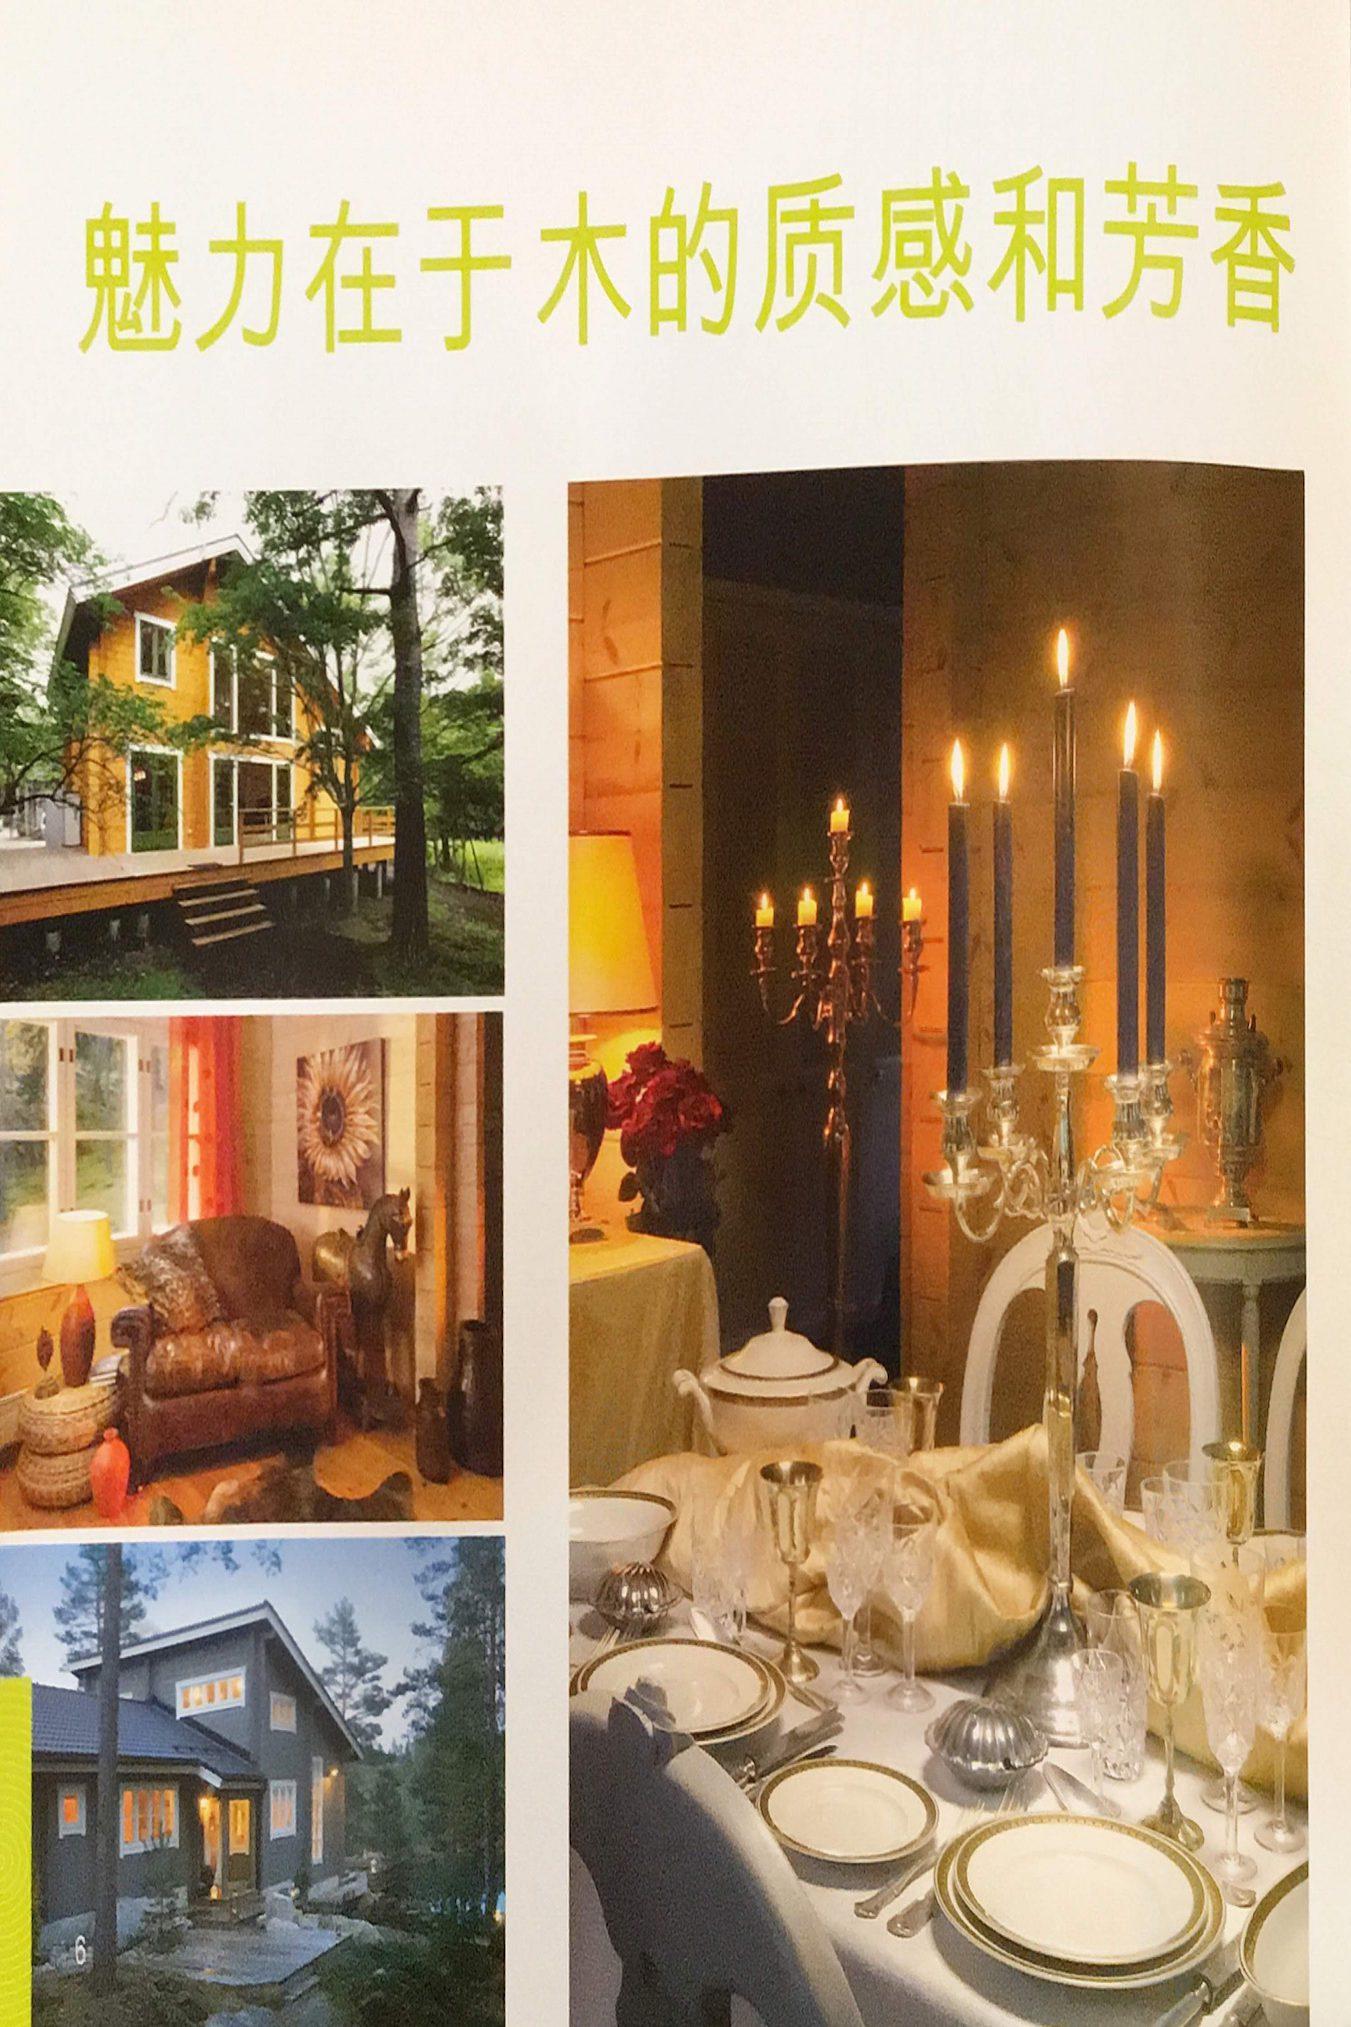 tekway-company-leaflets-brochures-vehasen-e1585129438217-2048x2027